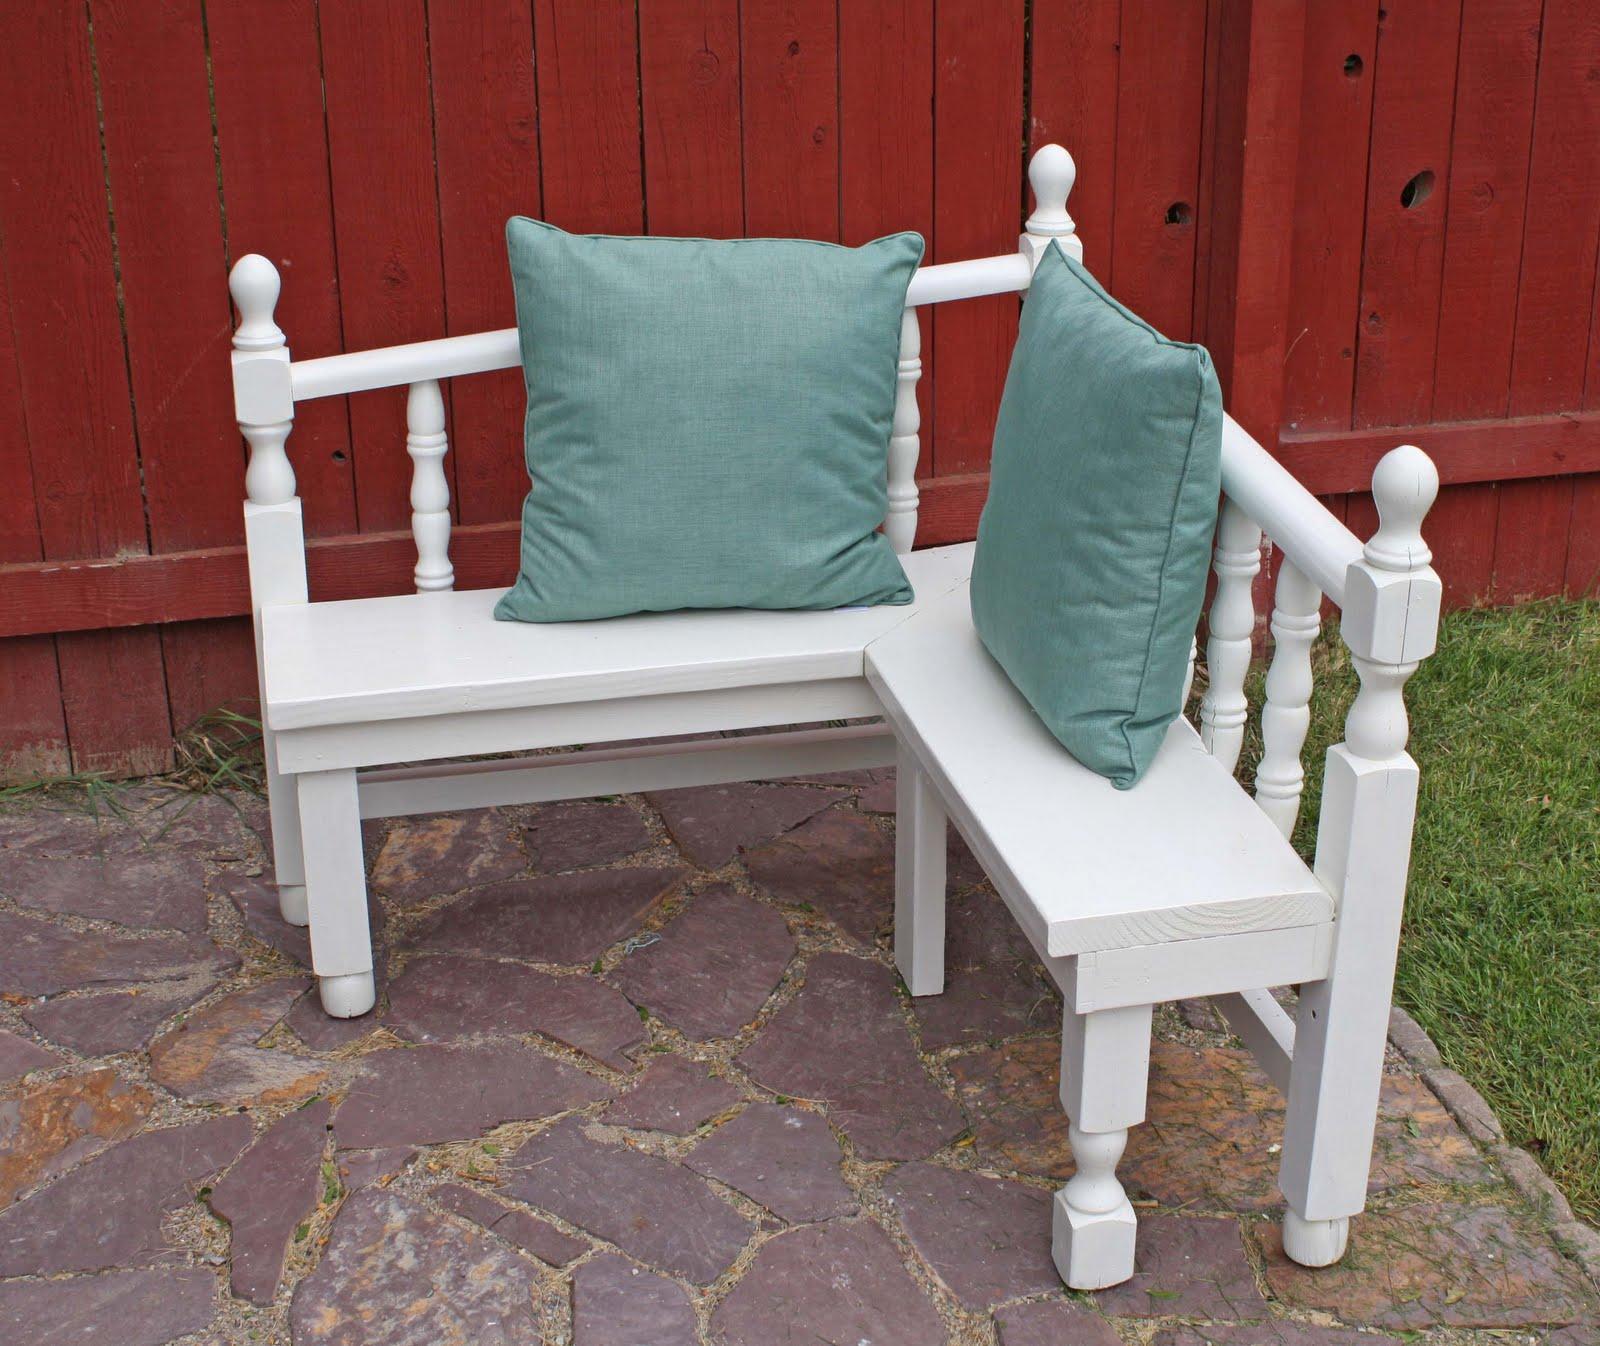 delight lutyens corner benches outdoor small garden attachment of bench hd